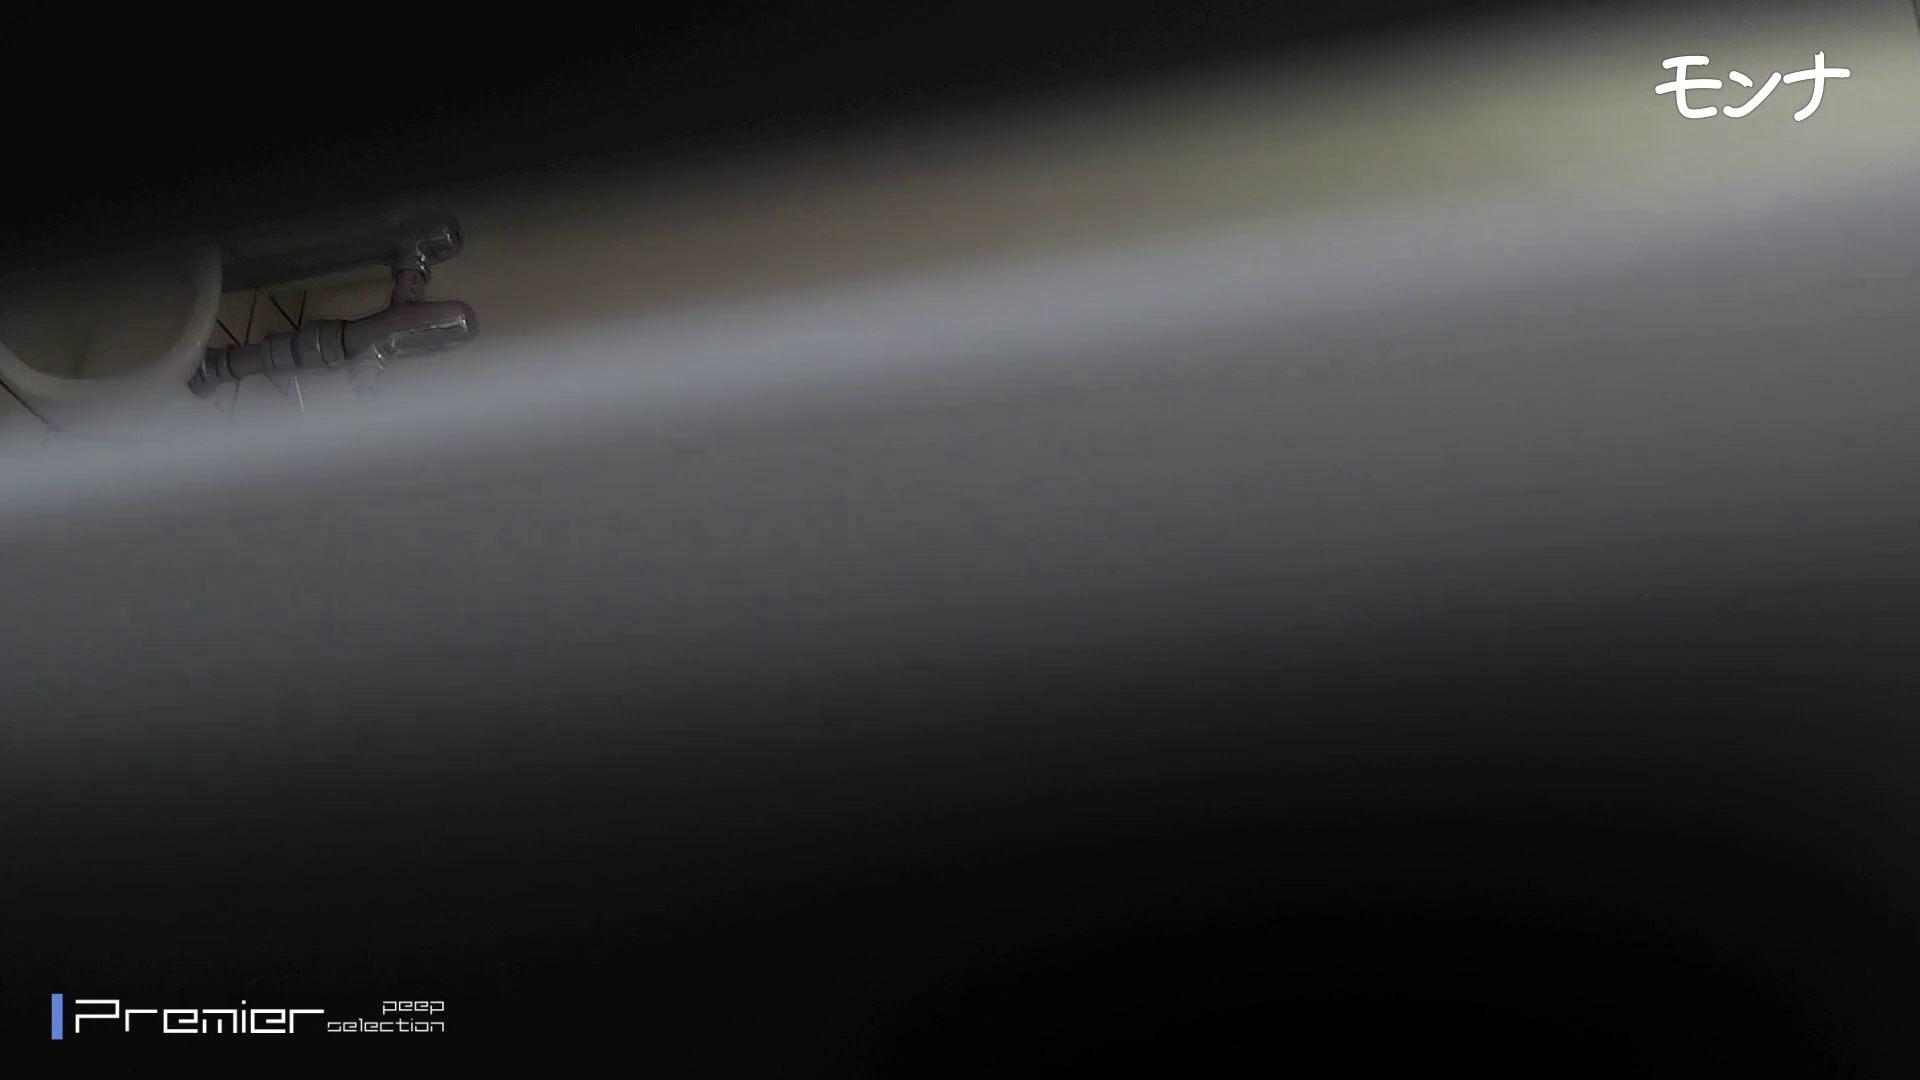 CM 清楚なお女市さんから流れる綺麗な聖水【美しい日本の未来 No.125】 高評価 AV無料動画キャプチャ 107枚 87